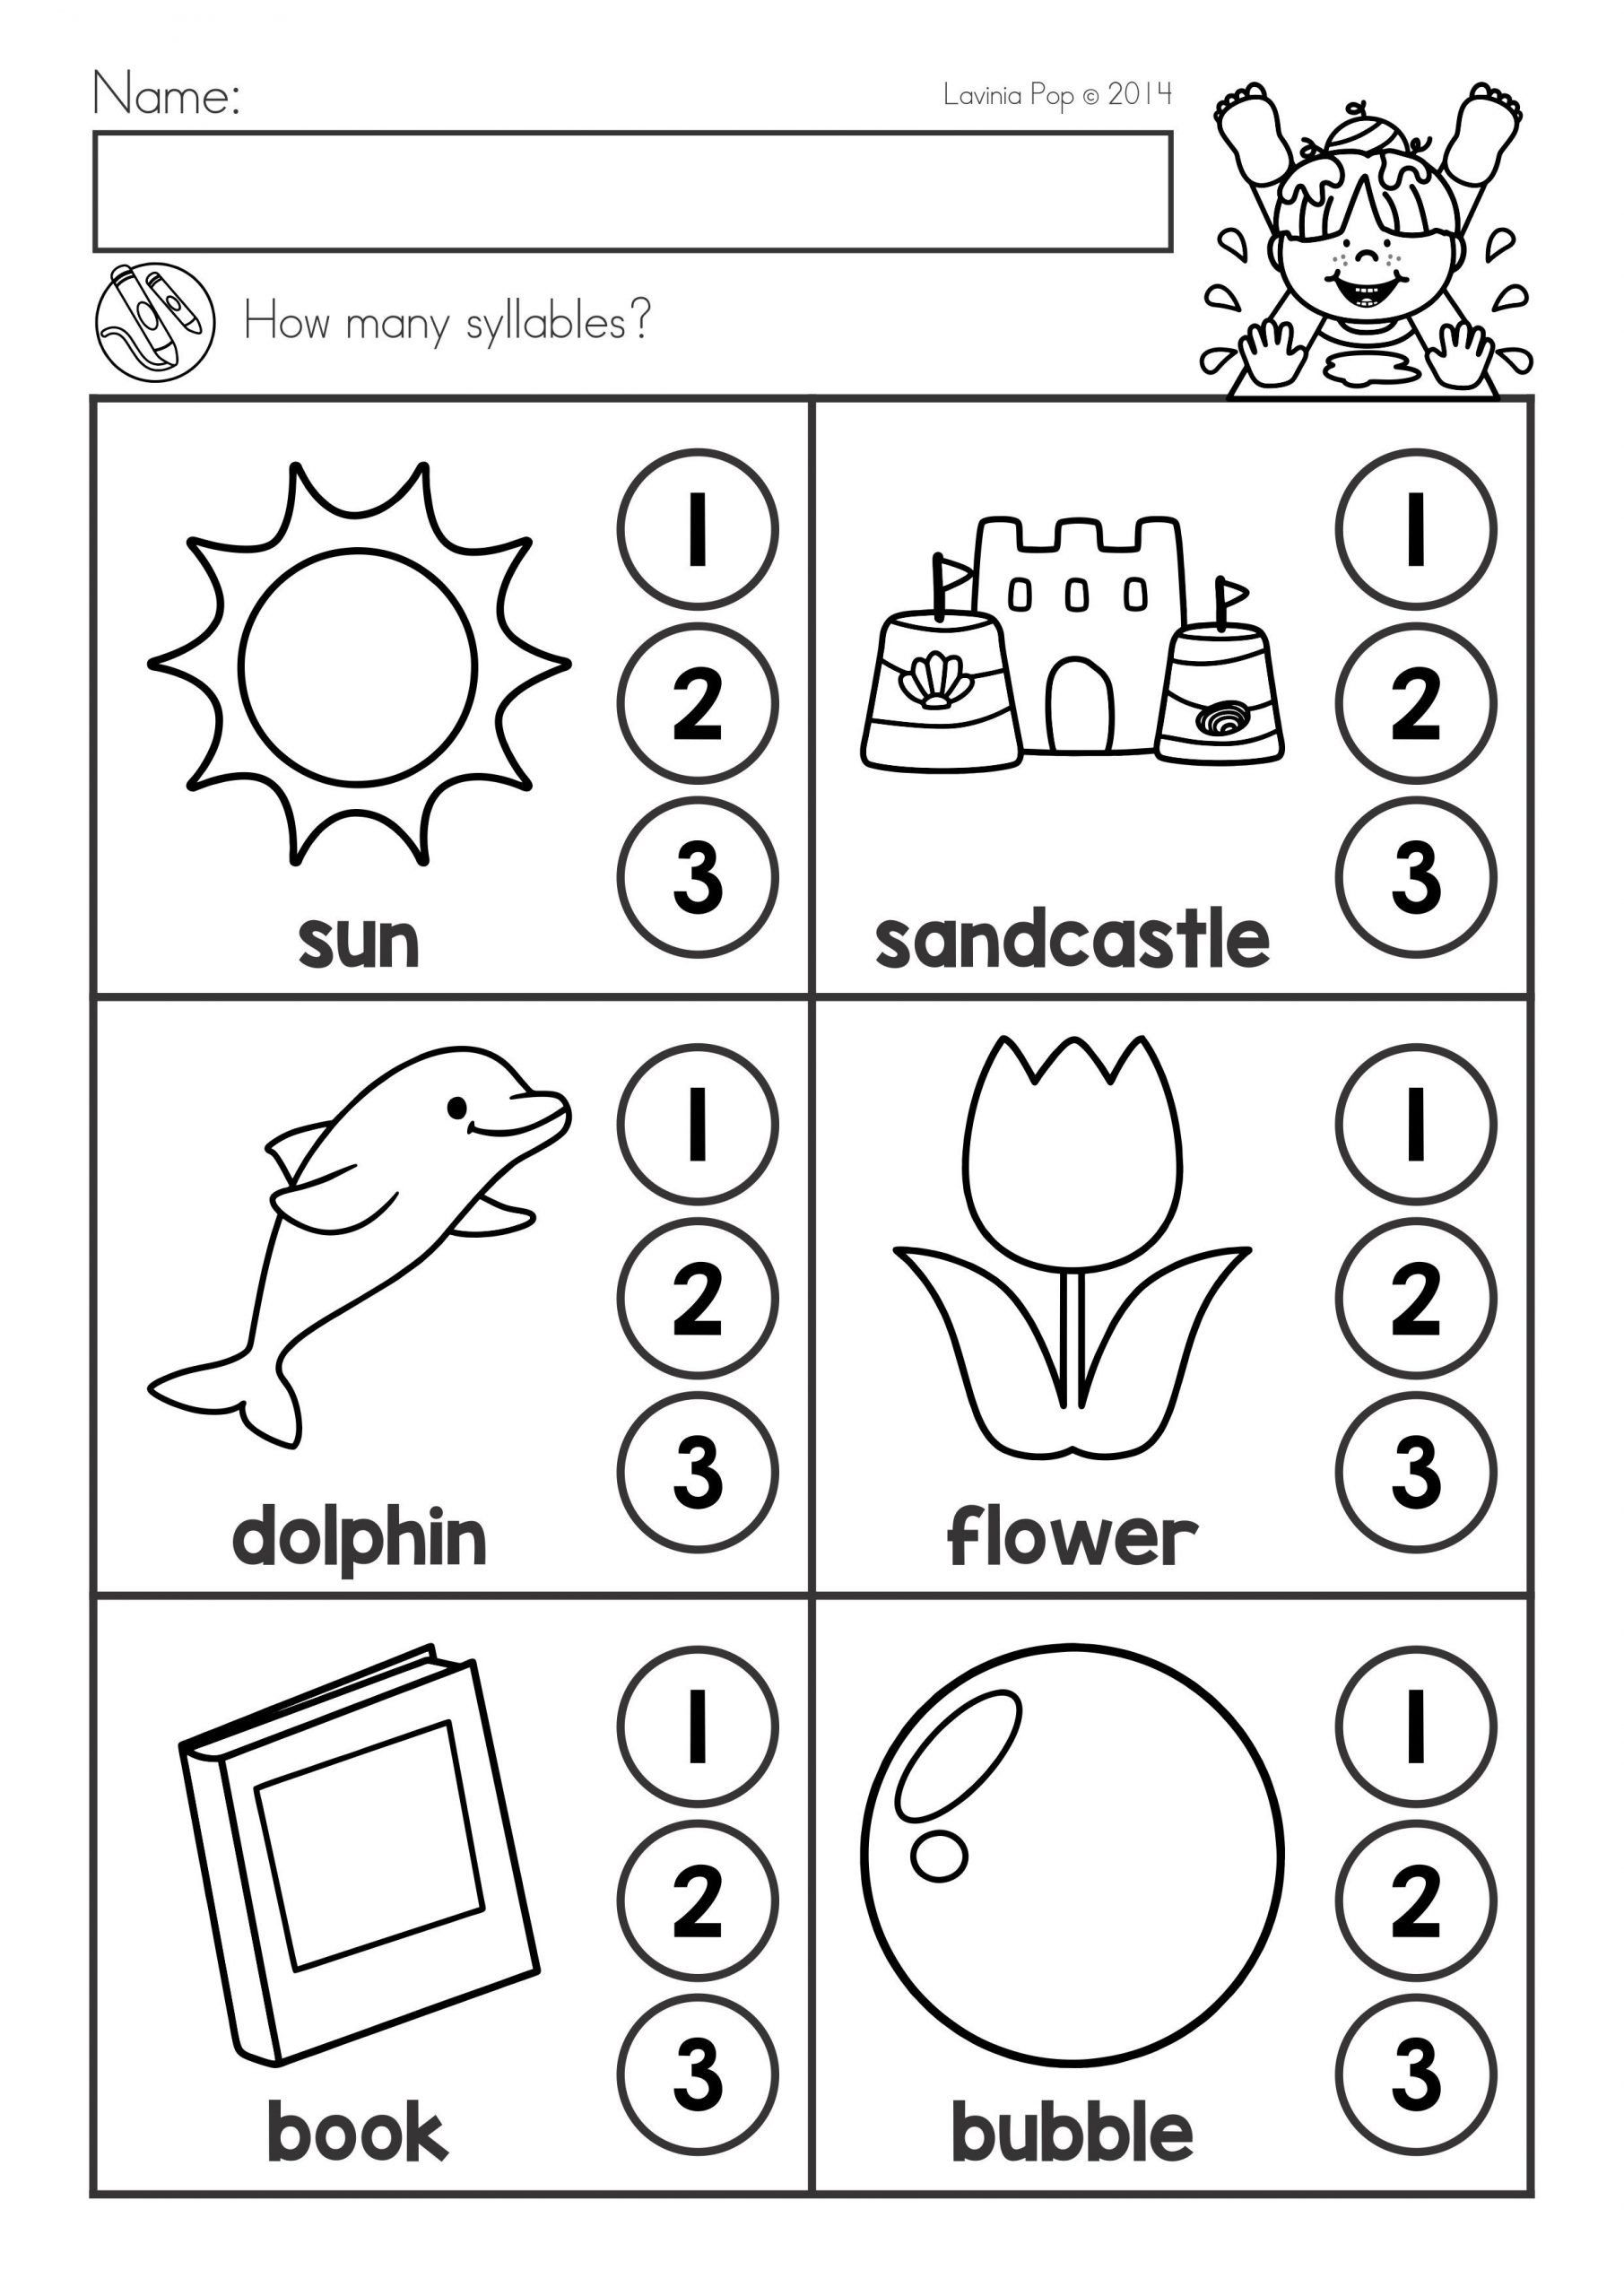 Syllables Worksheet For Kindergarten Summer Review Kindergarten Math Literacy Worksheets In 2020 Free Kindergarten Worksheets Syllable Worksheet Literacy Worksheets